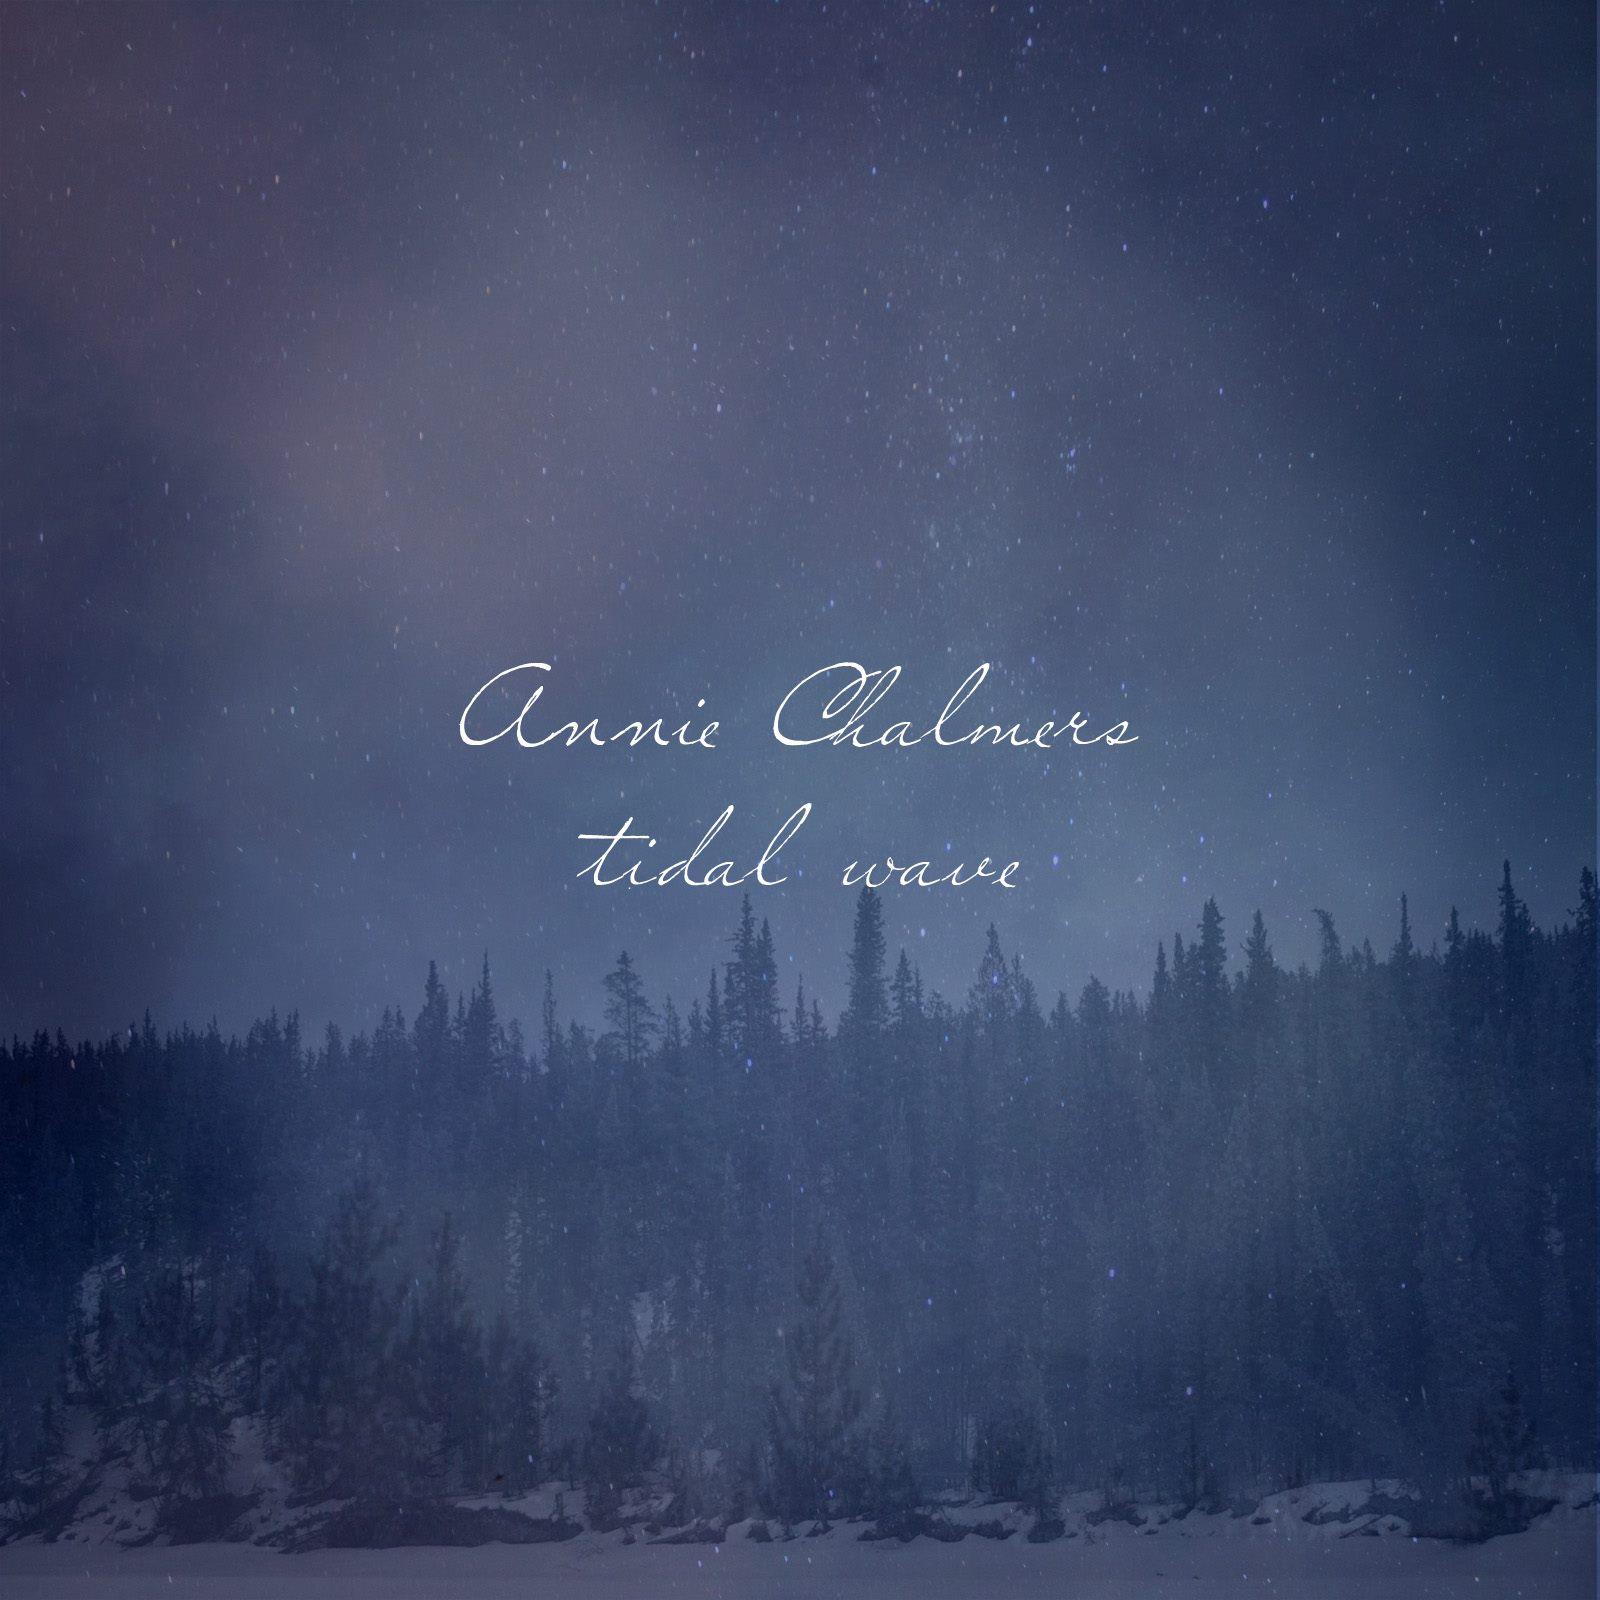 Annie Chalmers